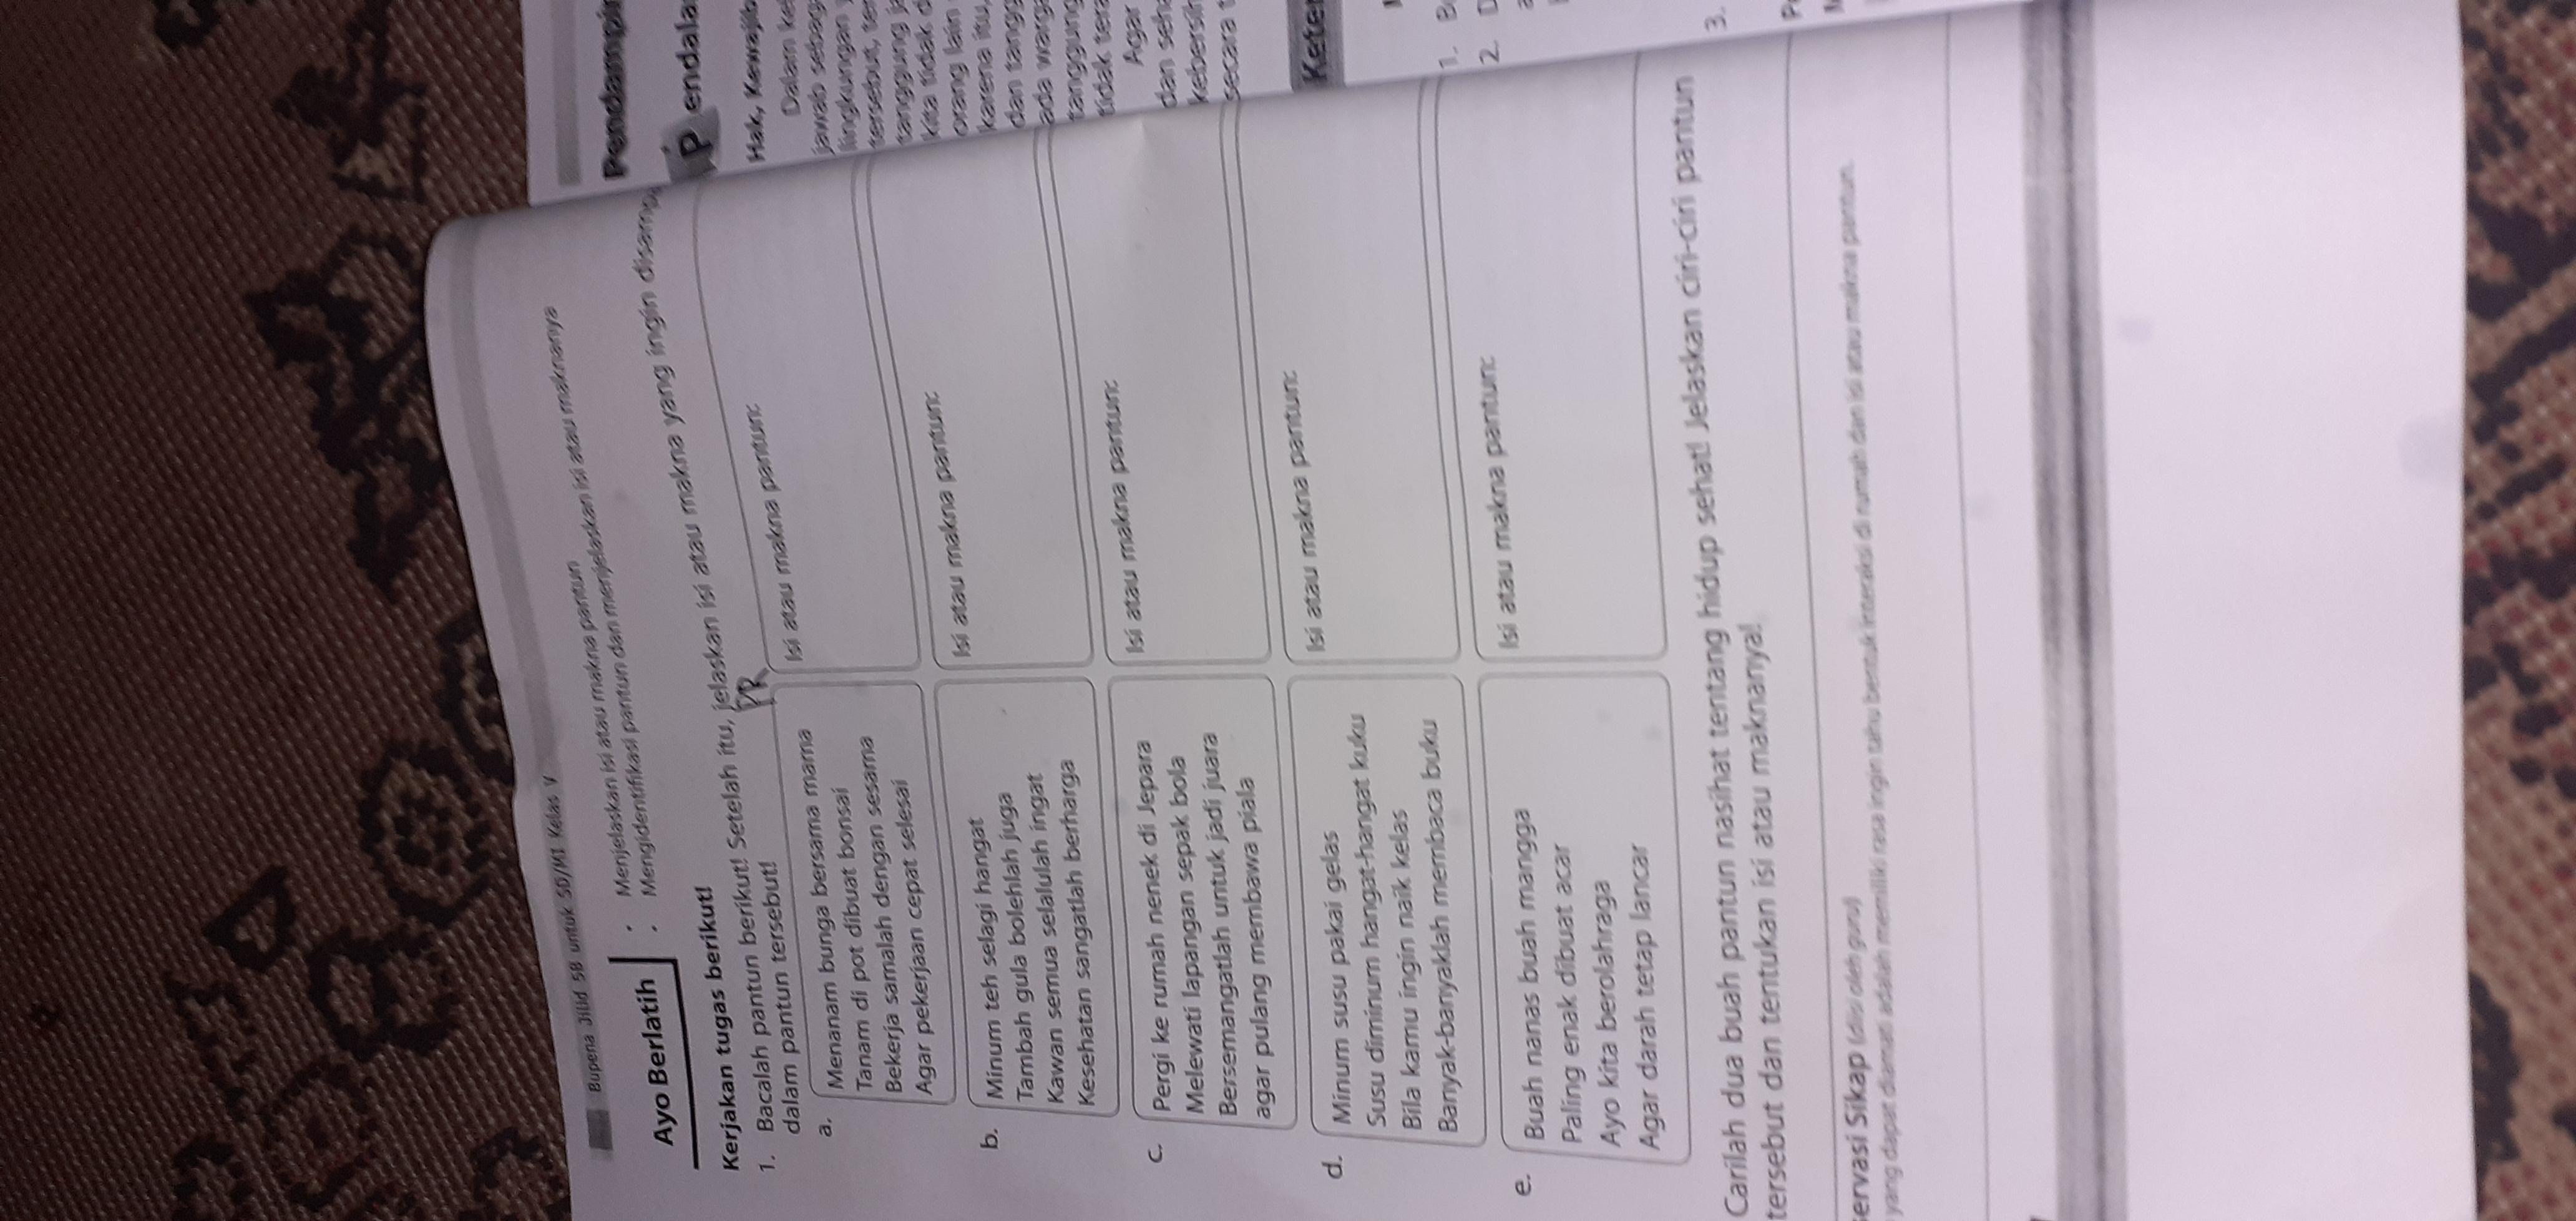 Kunci Jawaban Bupena Kelas 5 Jilid 5b Halaman 14 Brainly Co Id